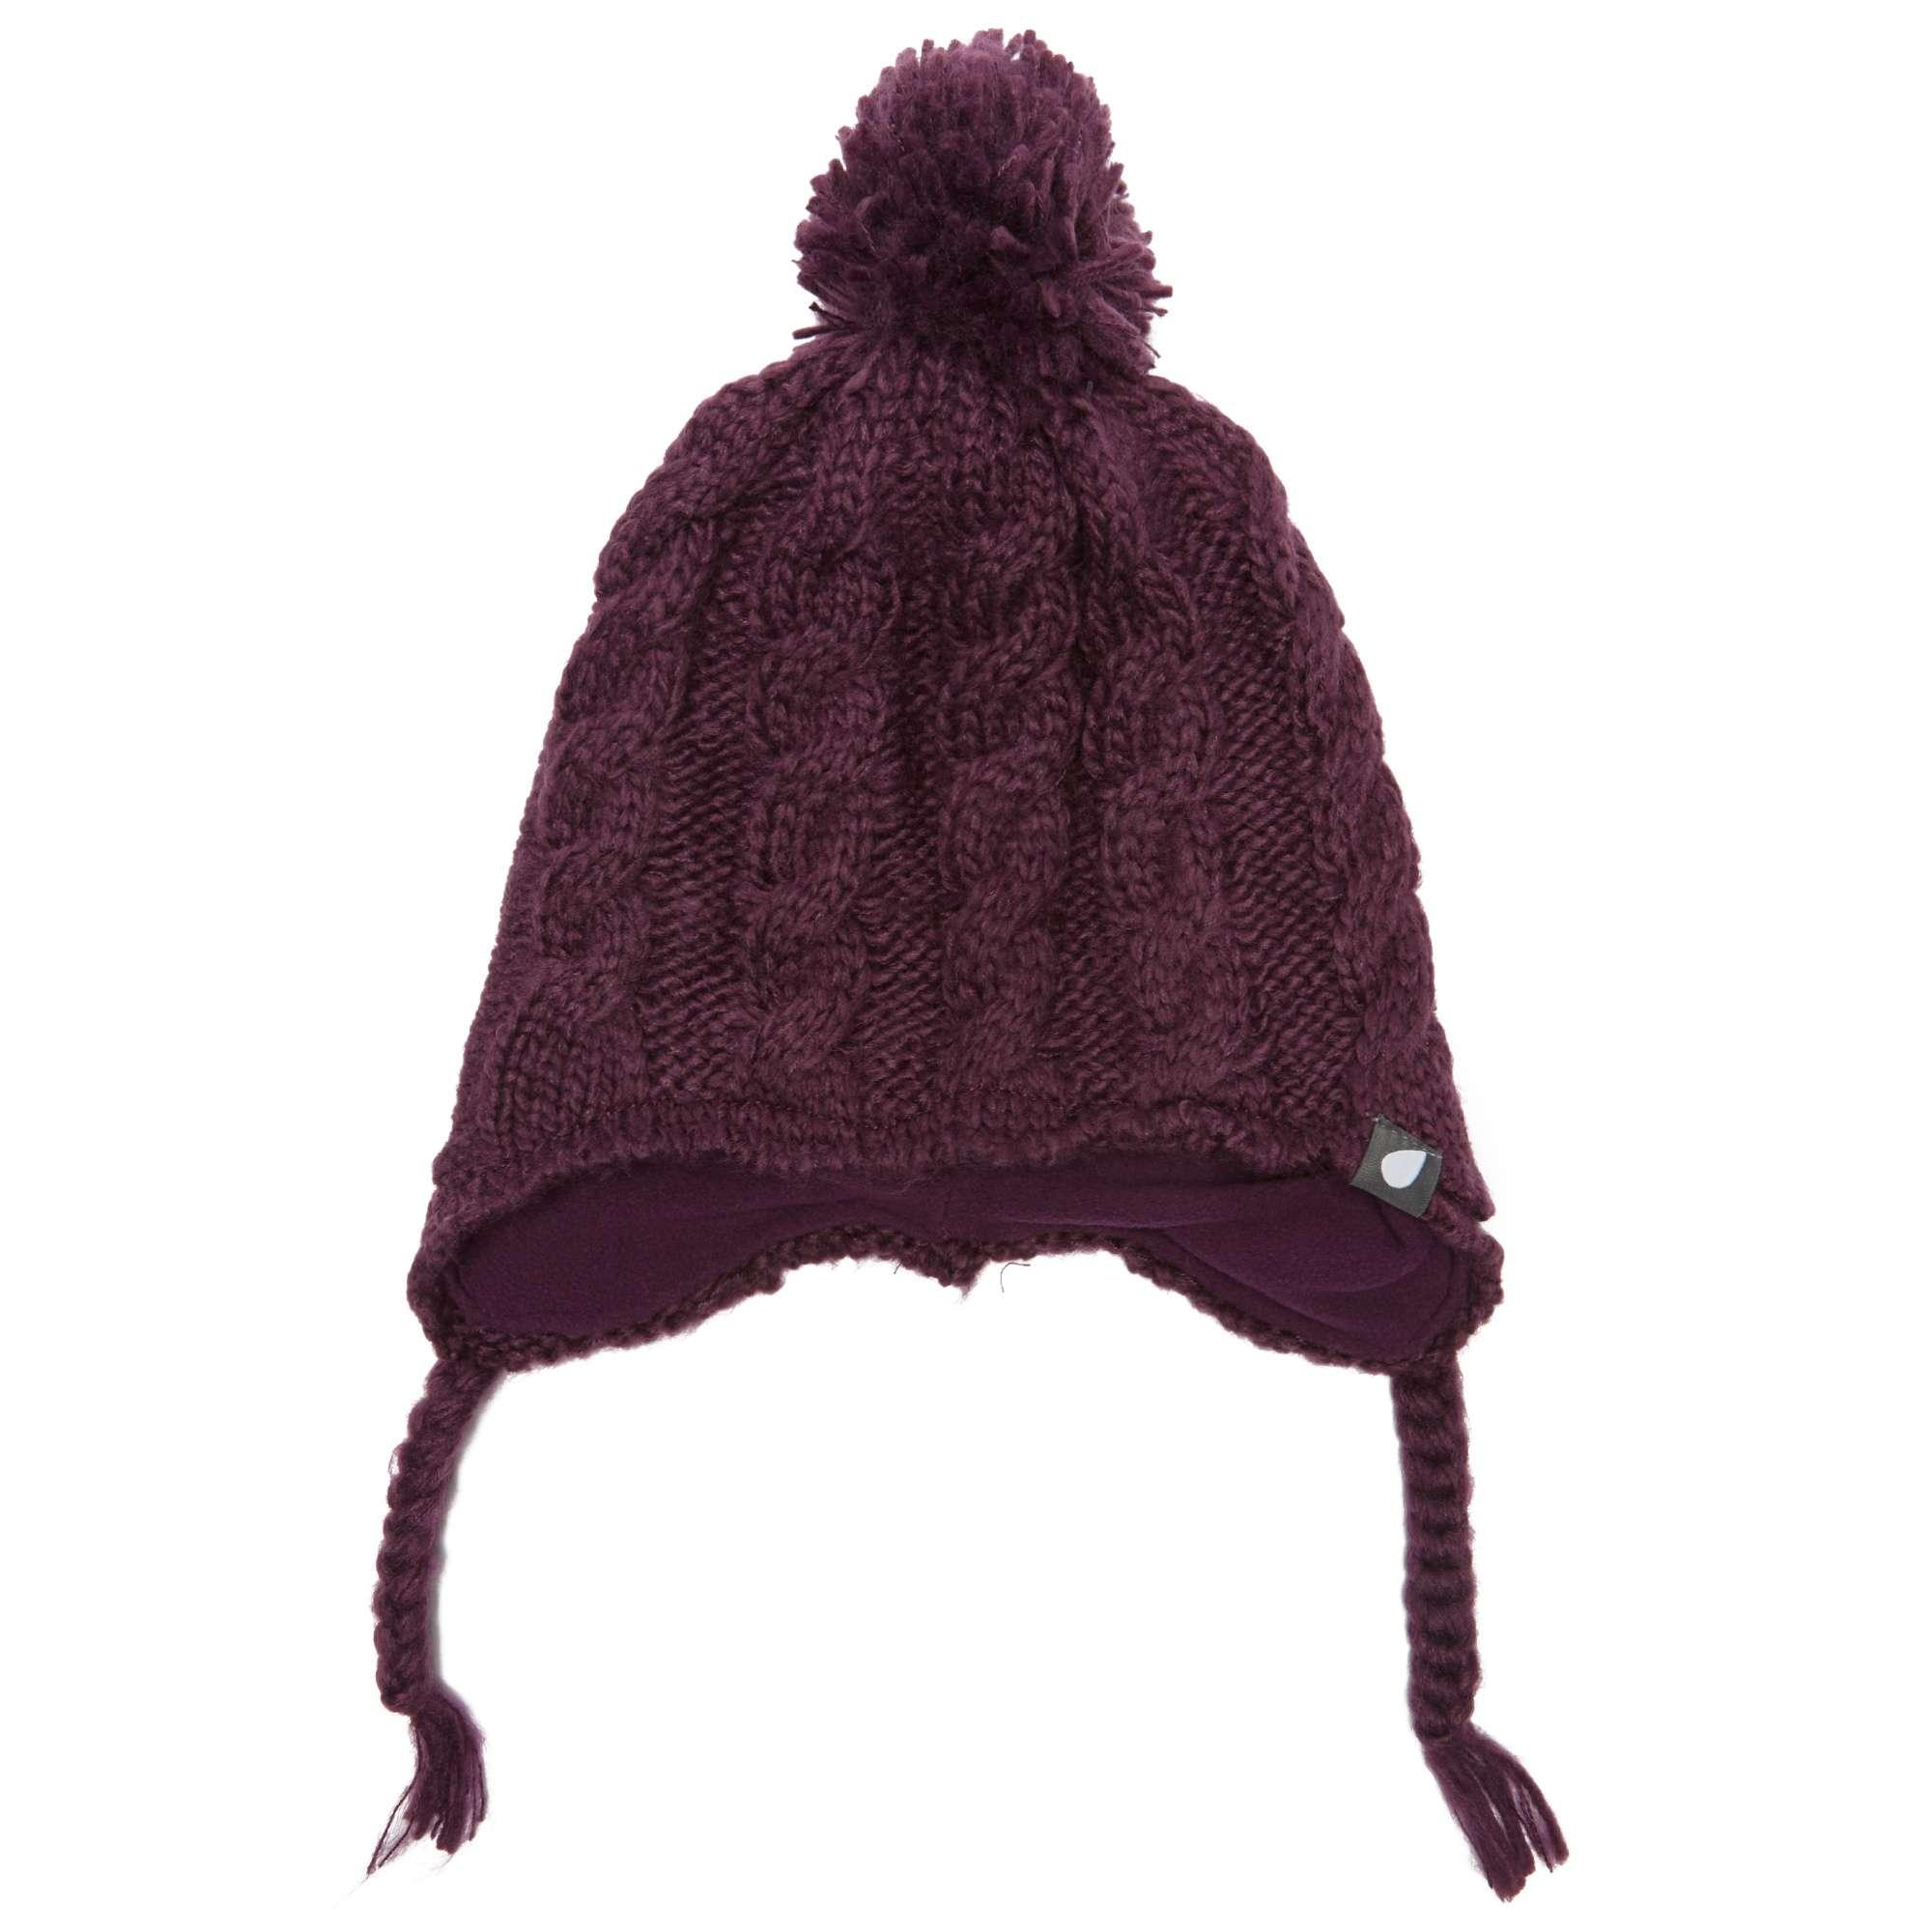 PETER STORM Women's Molly Inca Earflap Hat